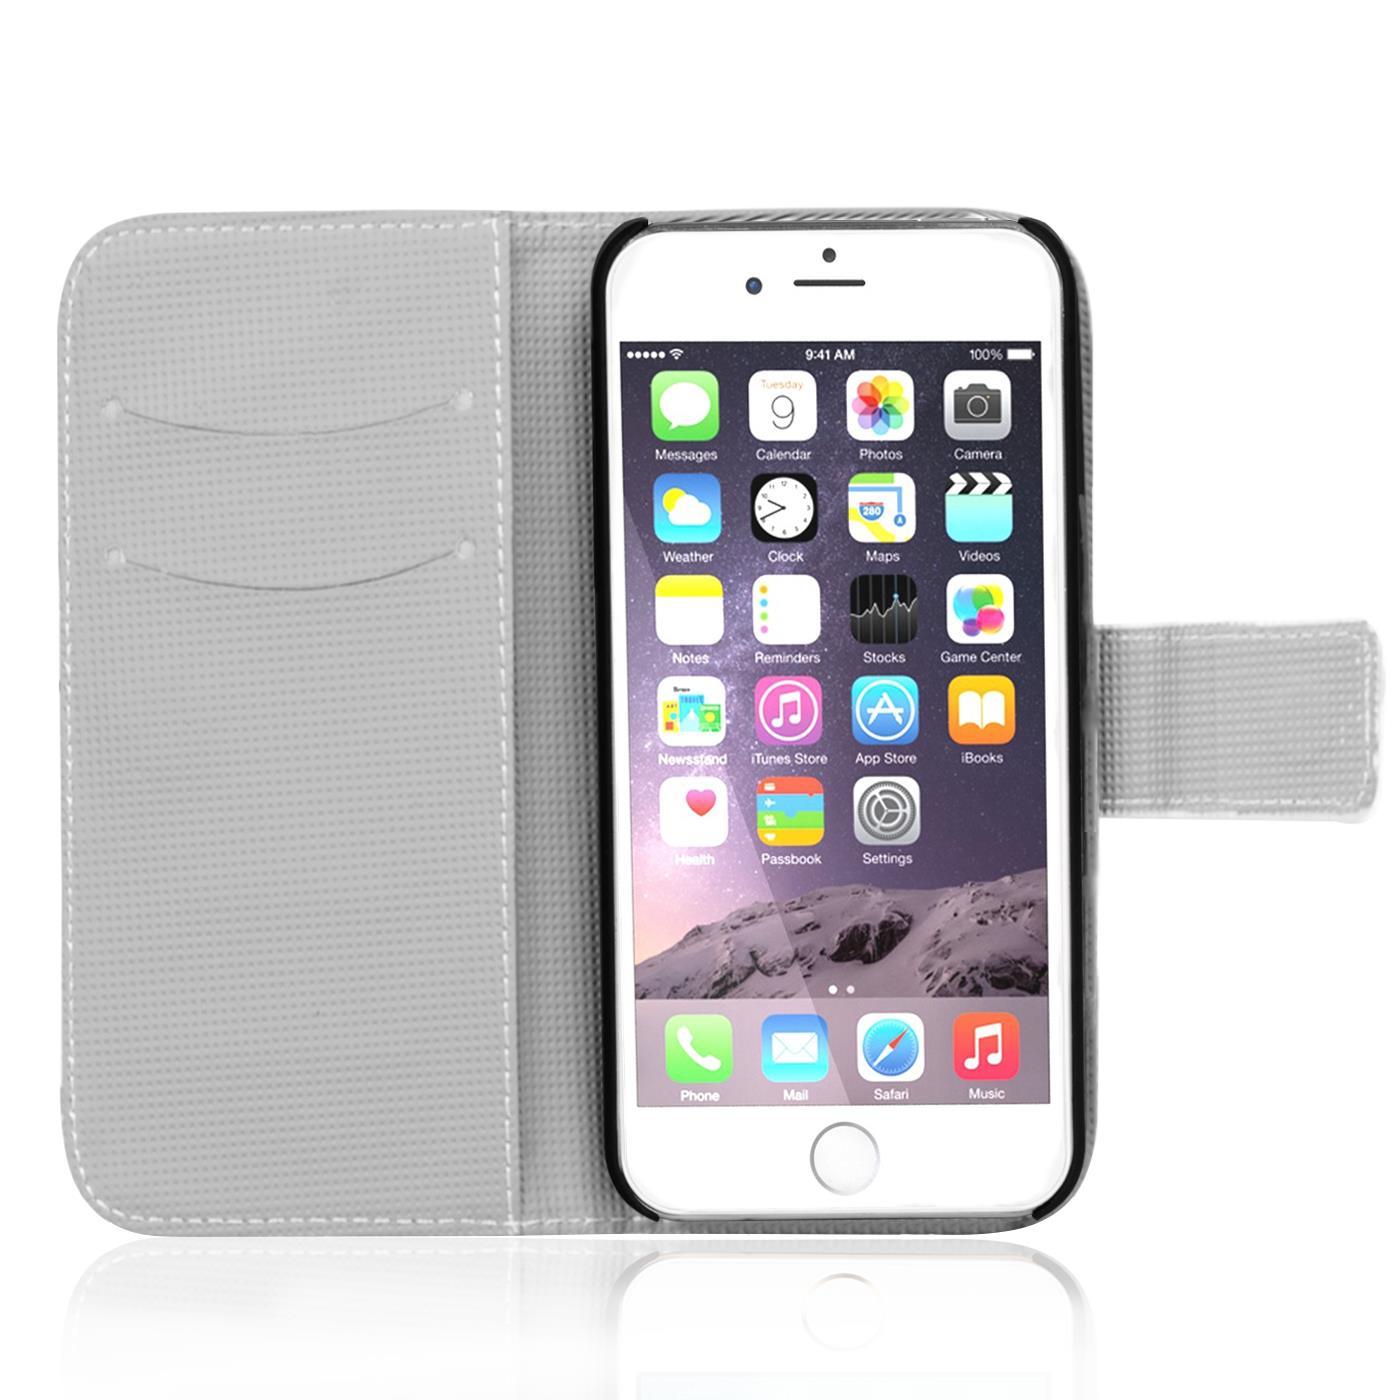 tasche f r apple iphone 6 6s plus flip cover case schutz. Black Bedroom Furniture Sets. Home Design Ideas